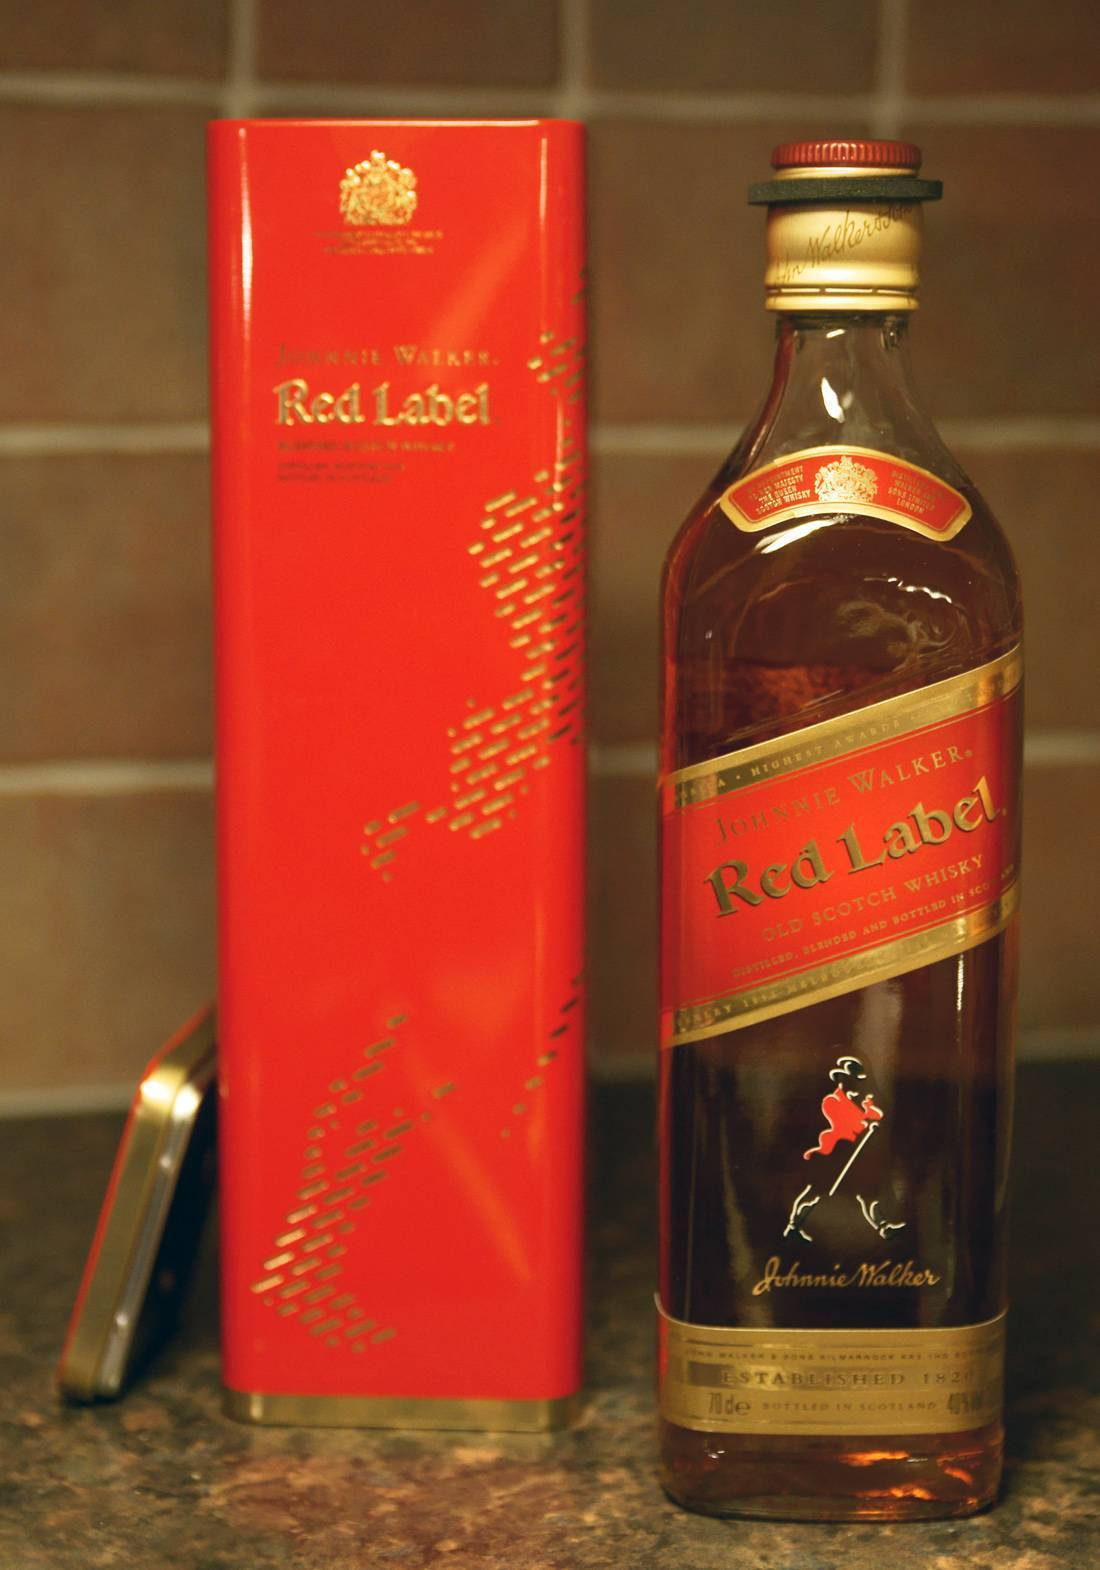 Обзор виски johnnie walker red label (джонни уокер ред лейбл)